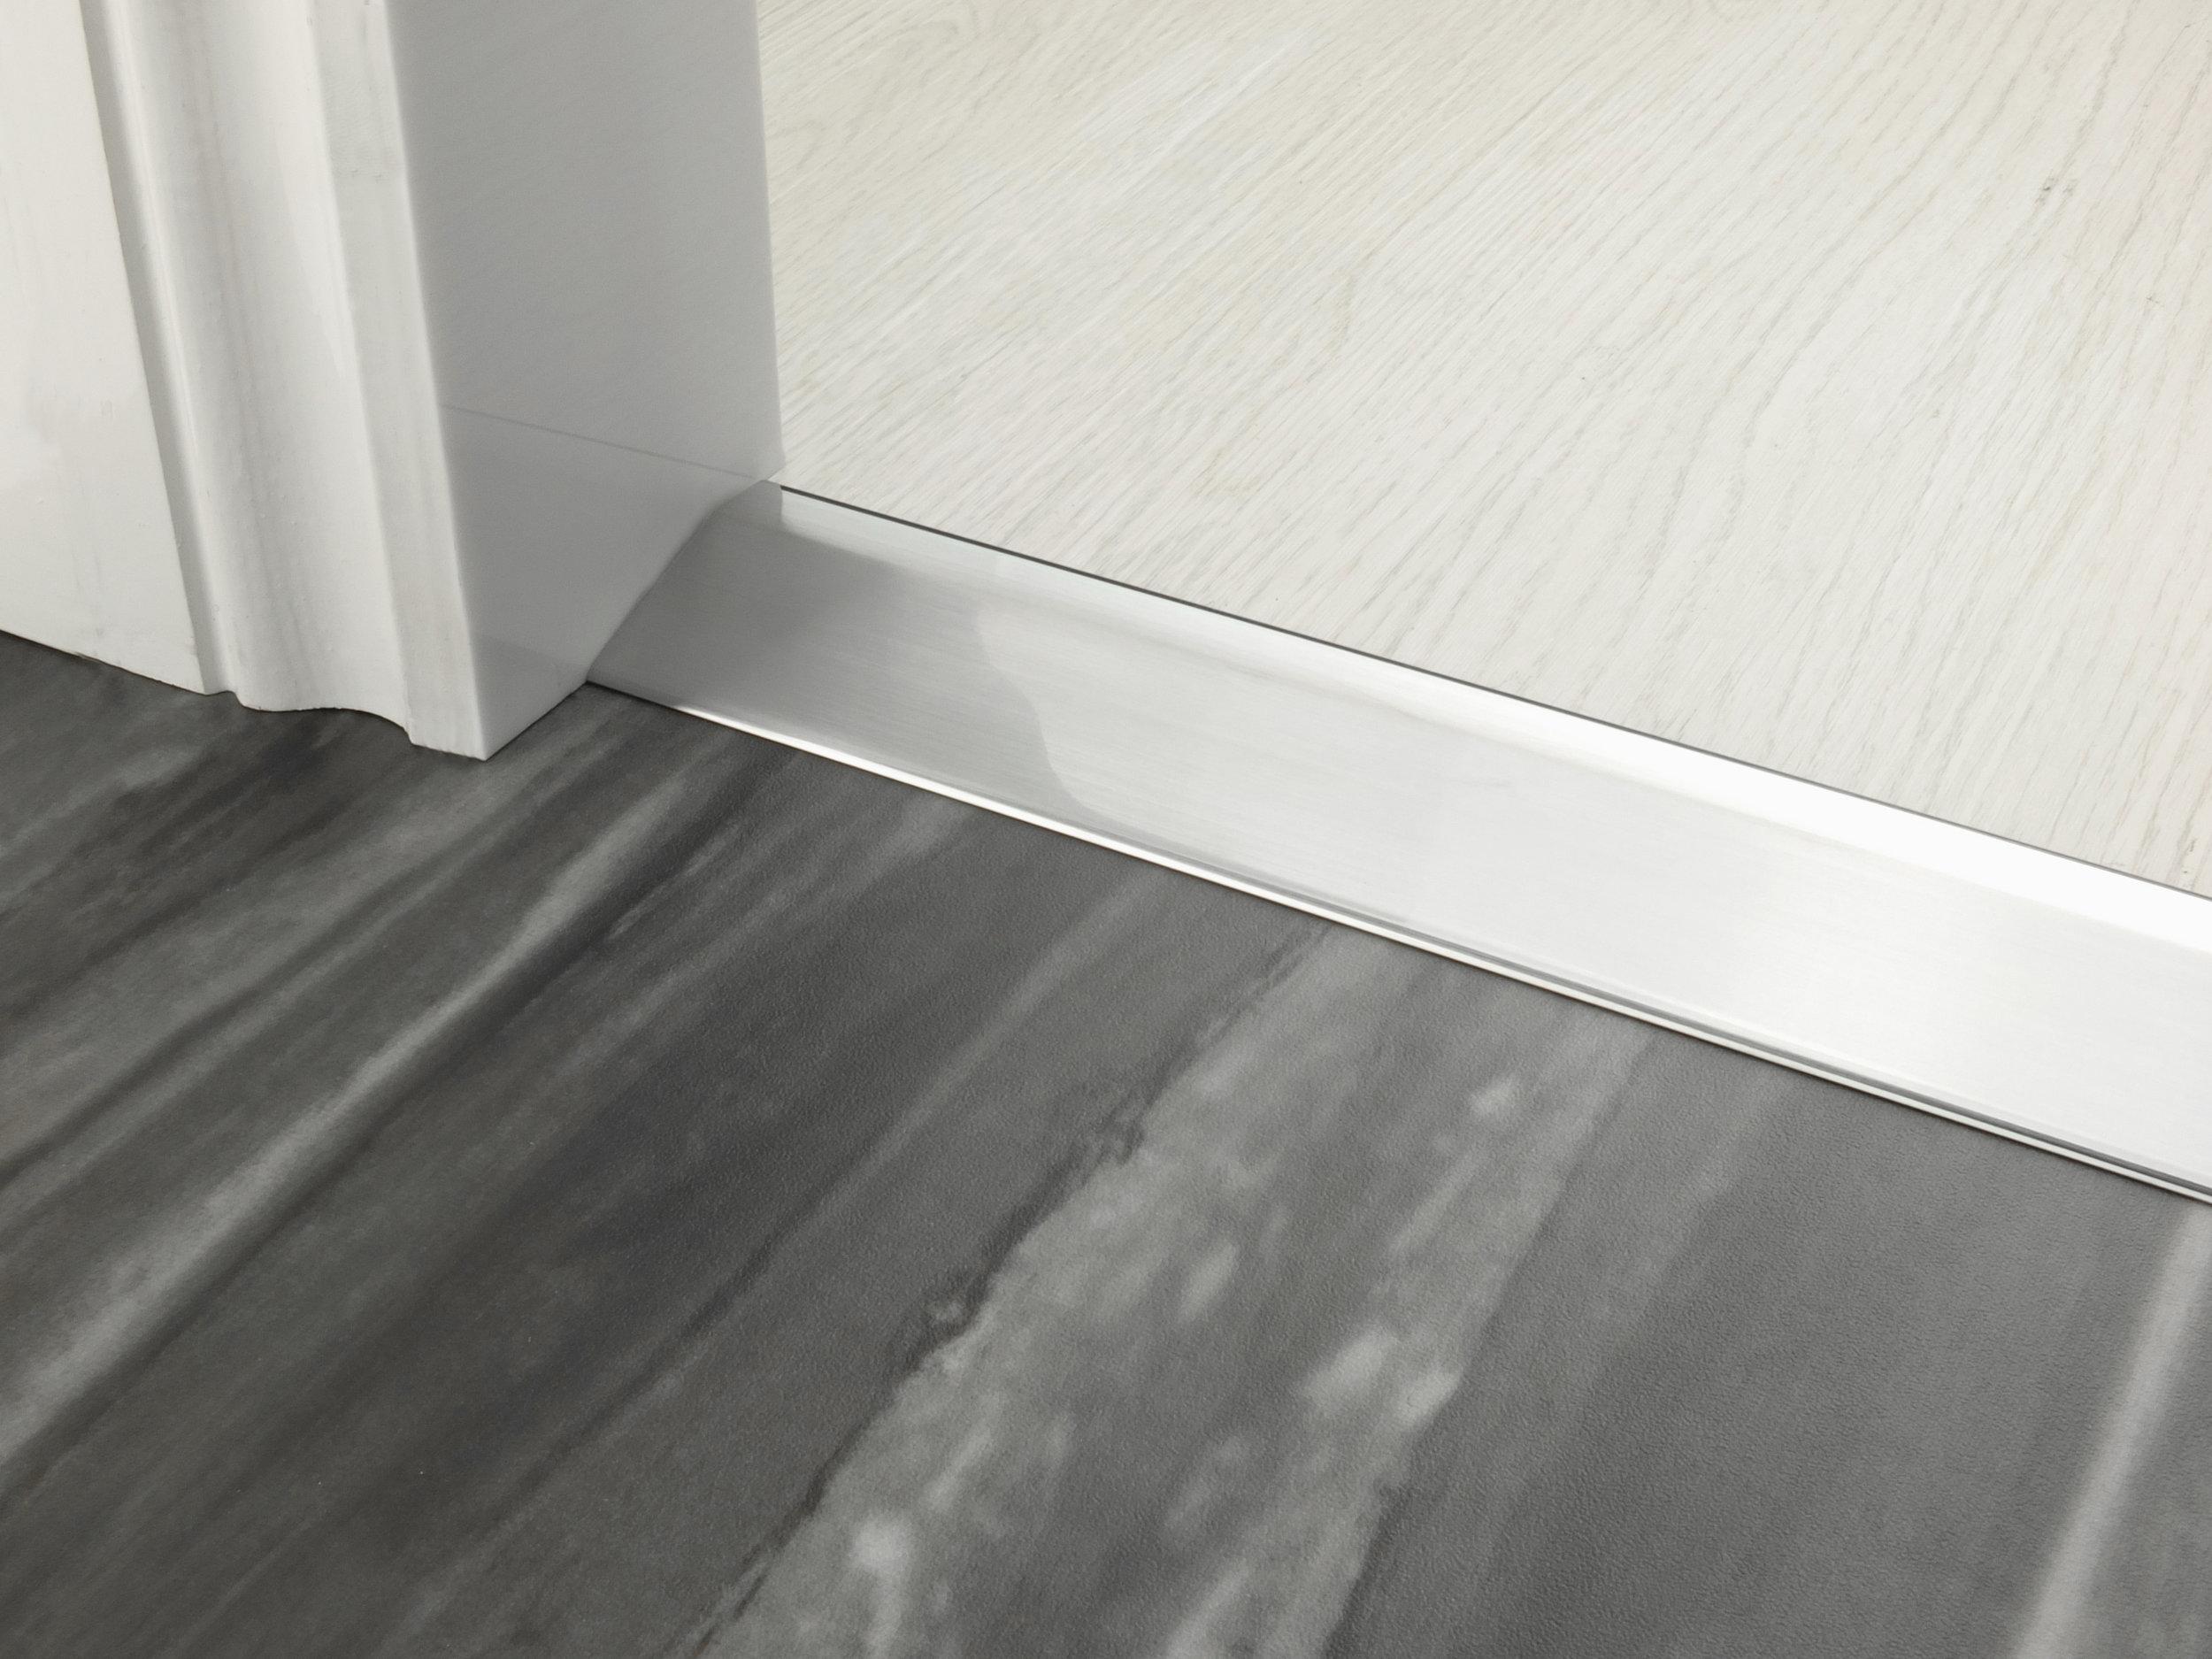 stairrods-doorbar-brushed-chrome-16mm-ramp.jpg